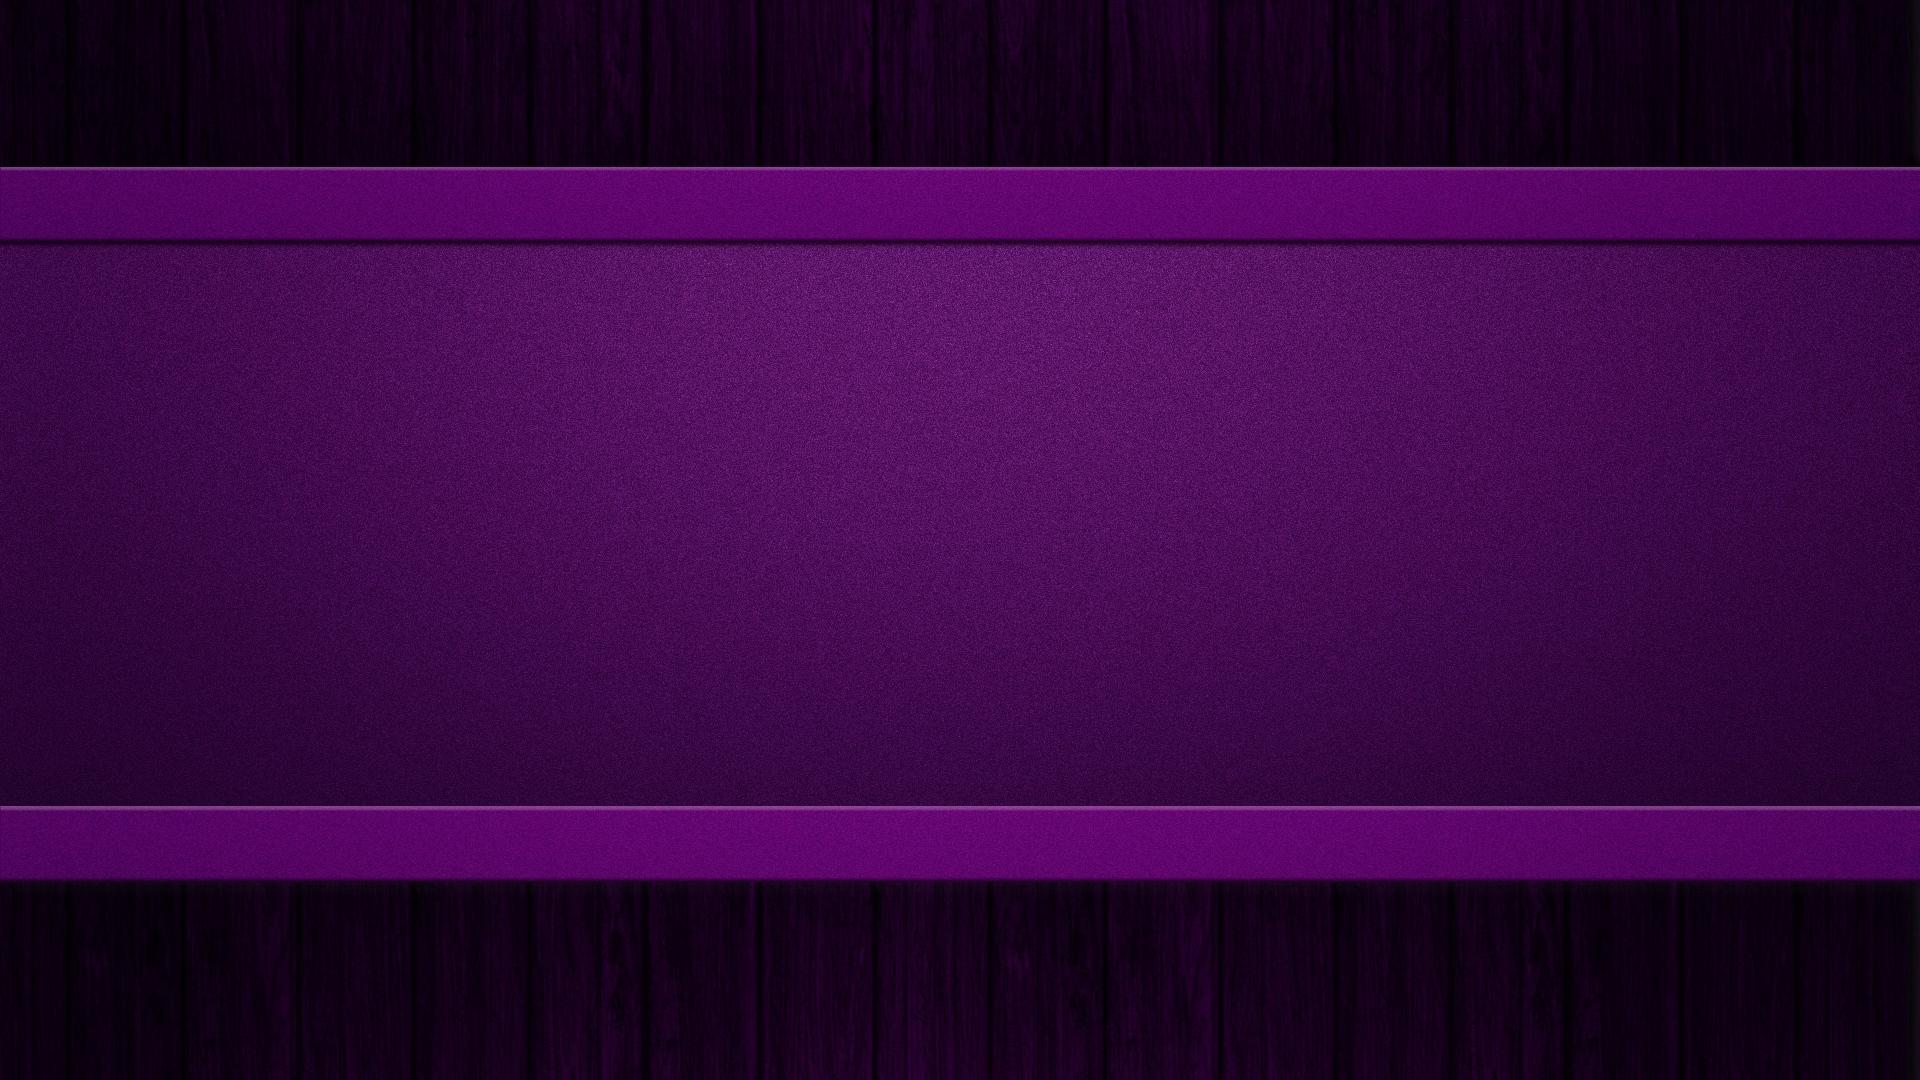 download wallpaper 1920x1080 texture stripes purple